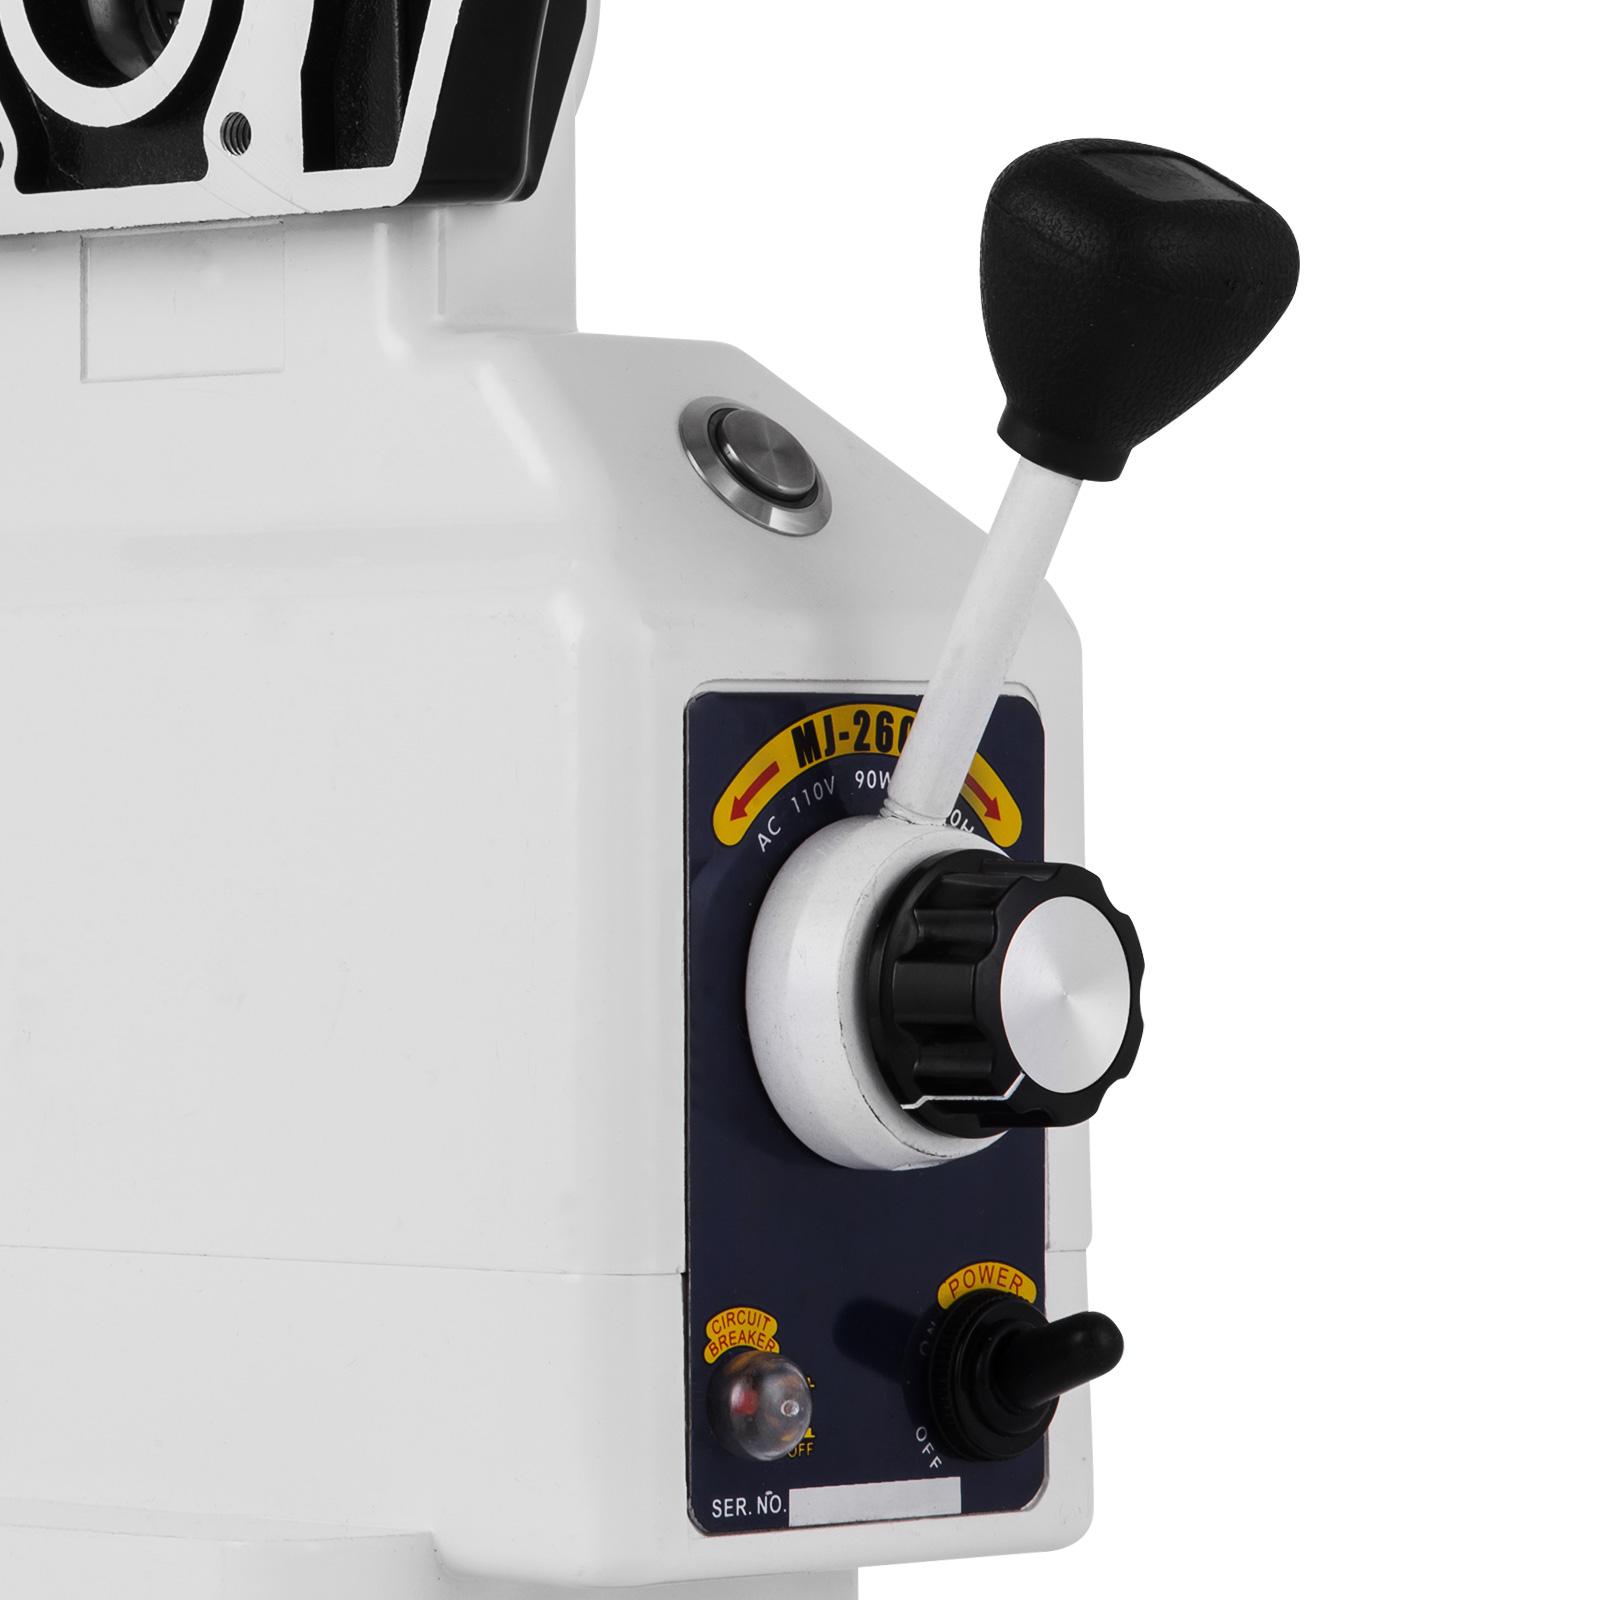 AL-310S X-AXIS Power Feed Milling Machine 0-200RPM 0.4-37.4 IPM X traverse